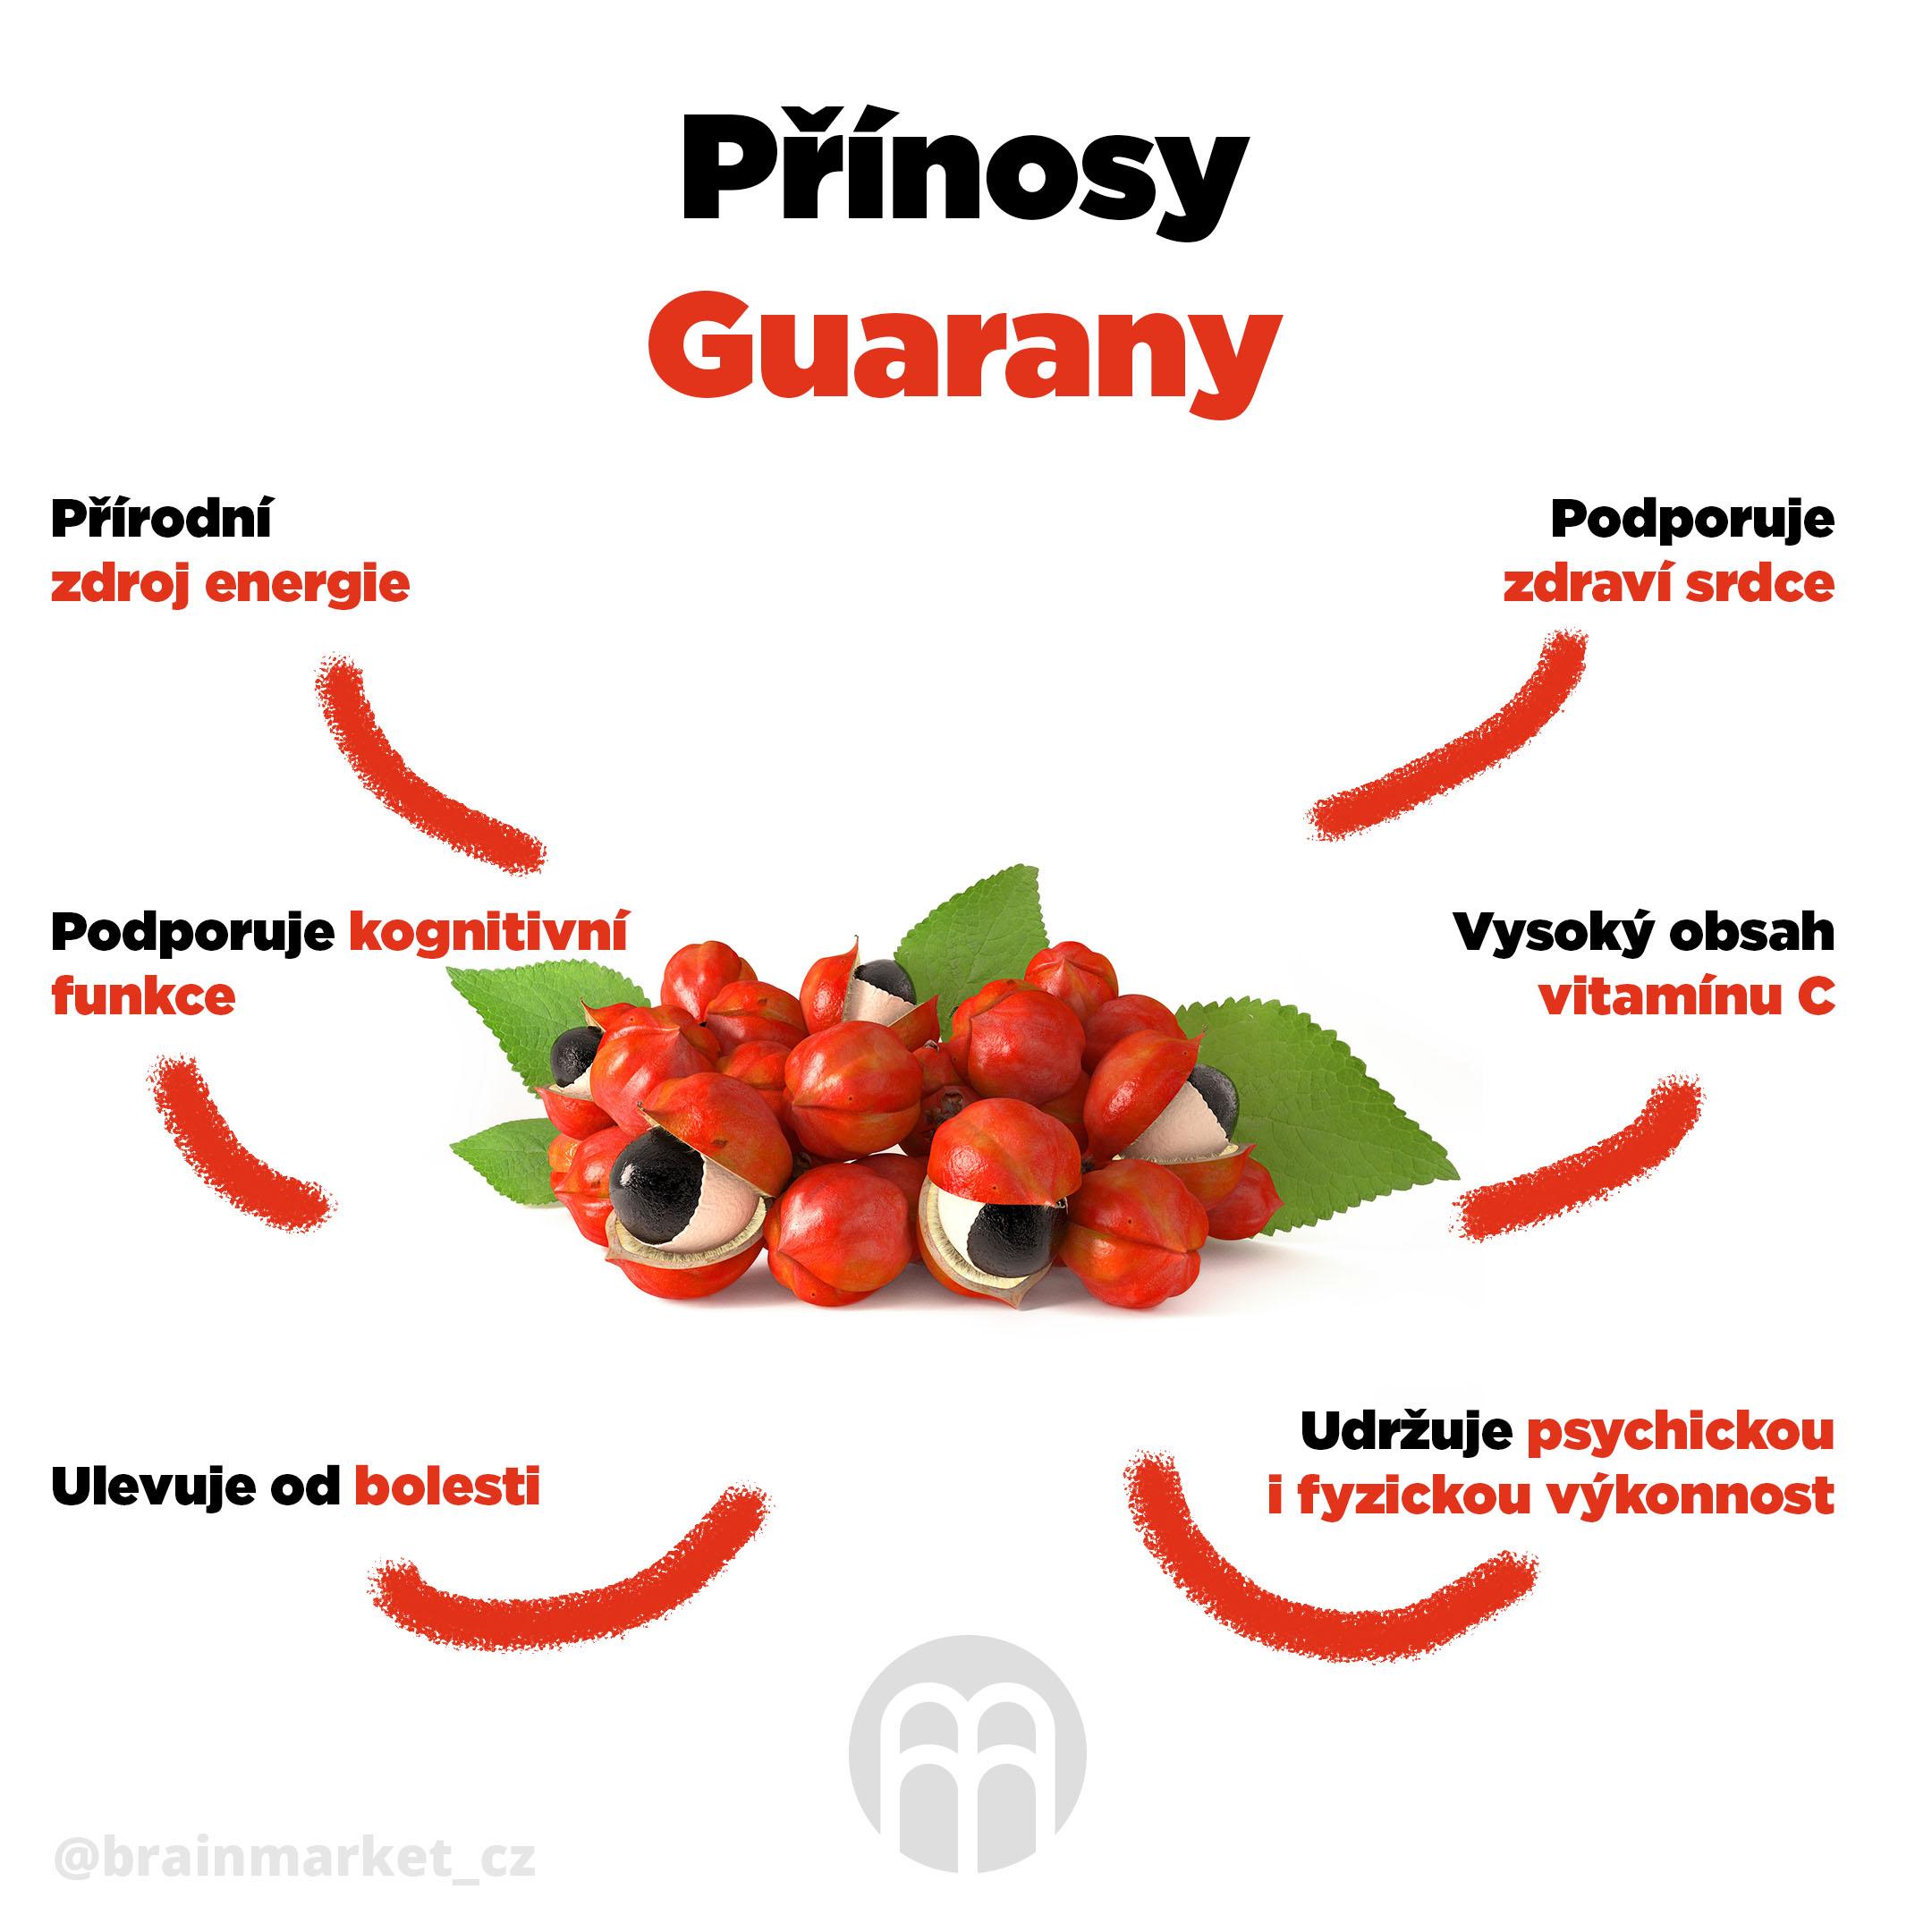 prinosy-guarany-infografika-brainmarket-cz